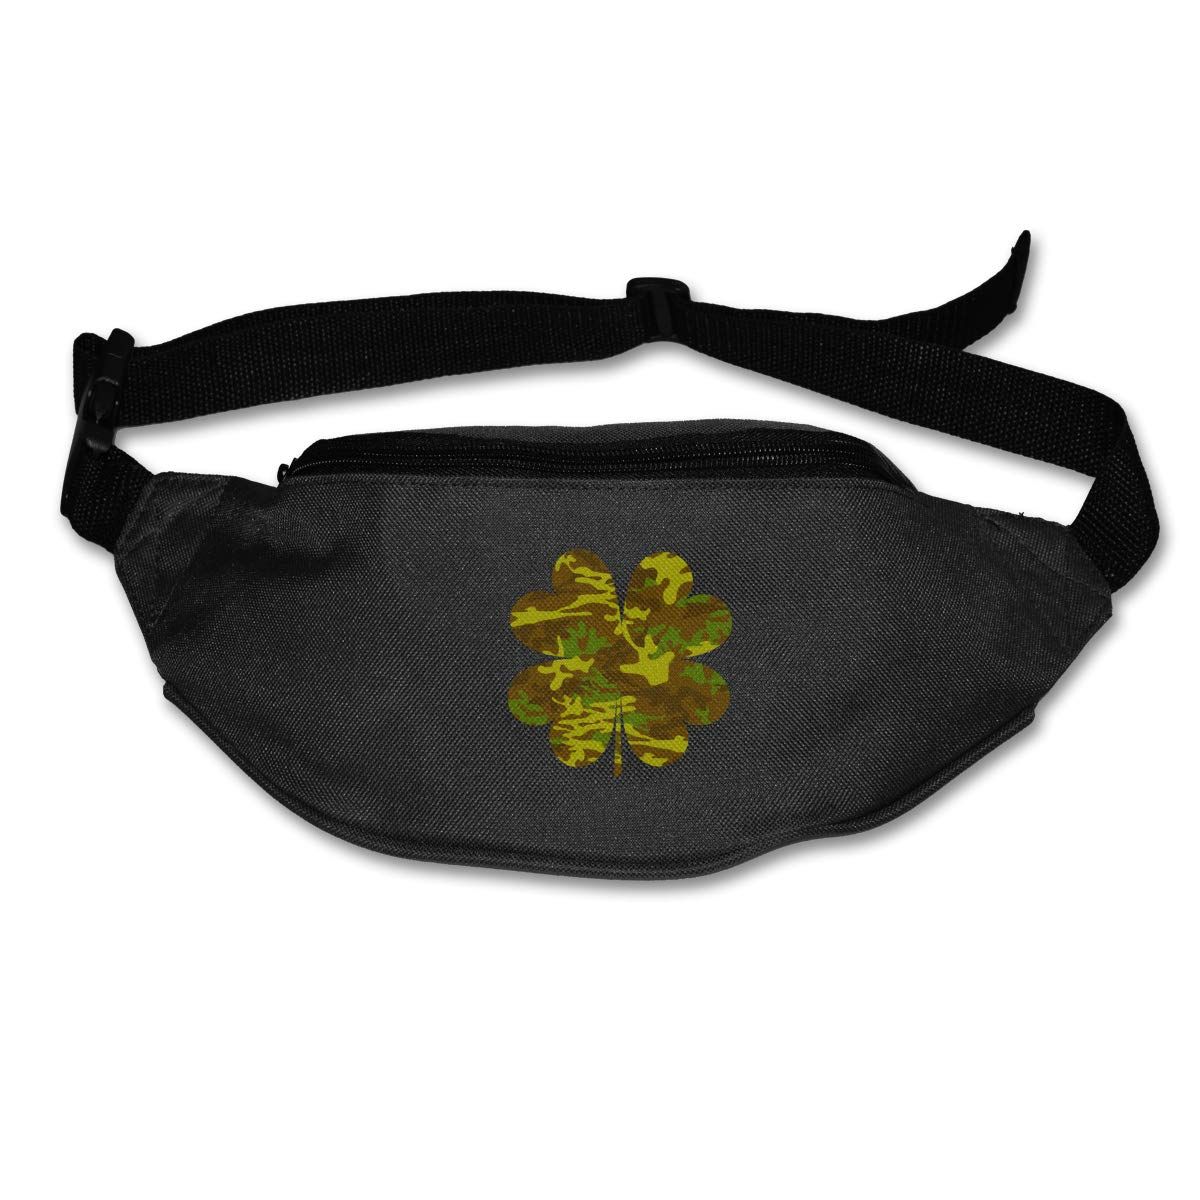 Camo Clover Sport Waist Pack Fanny Pack Adjustable For Travel